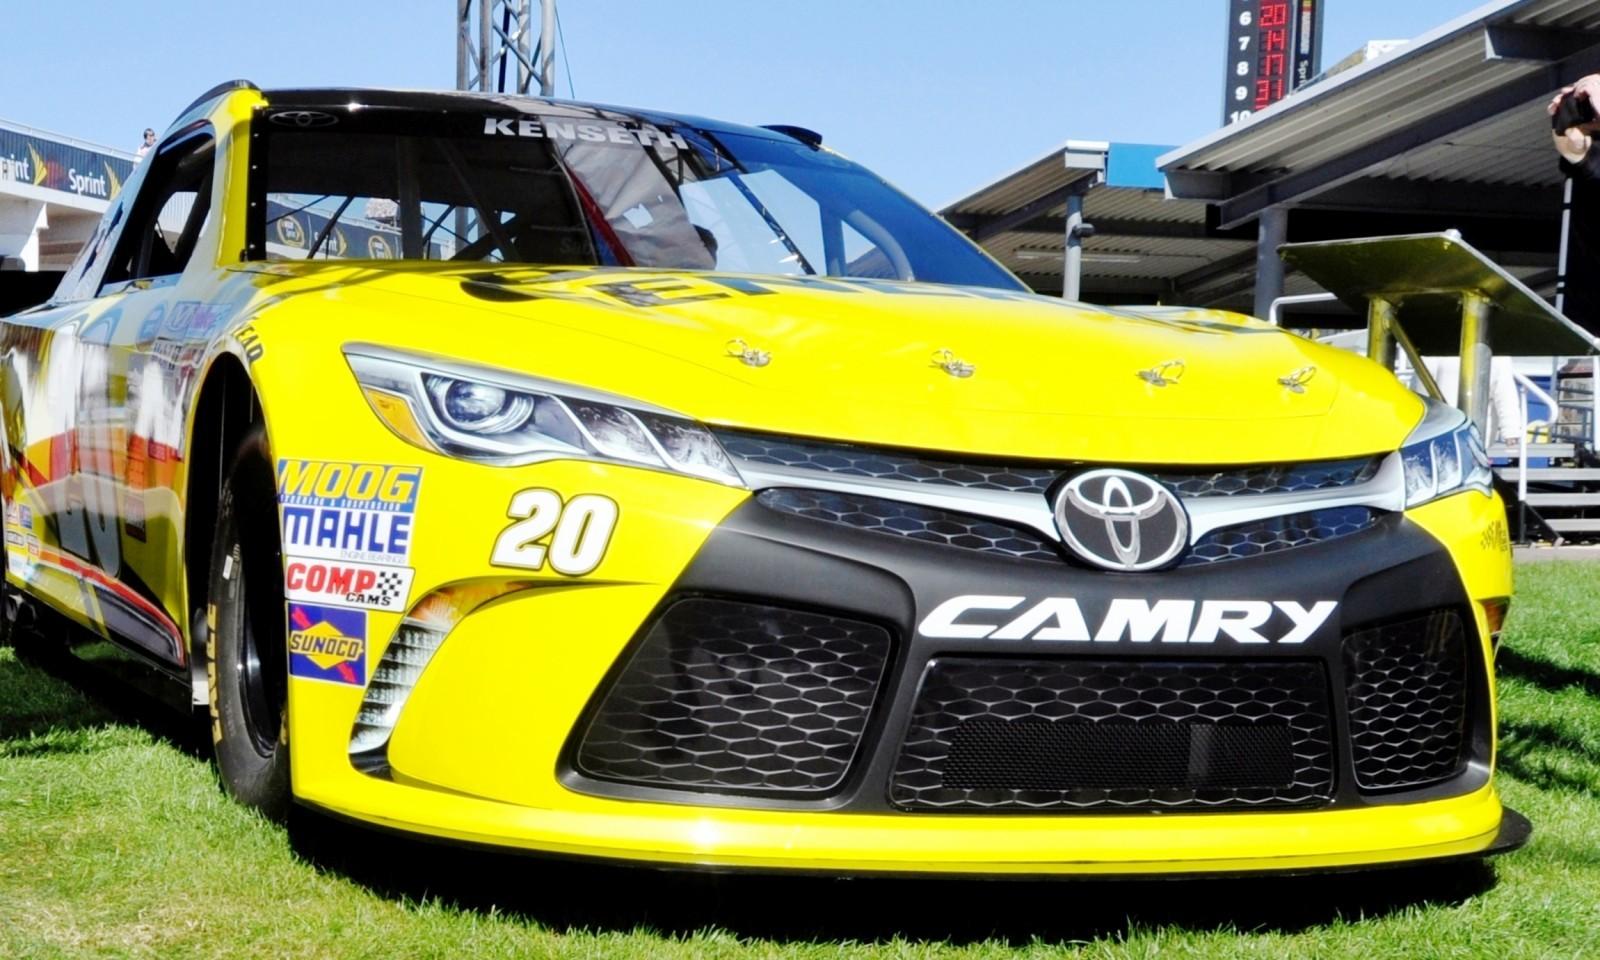 2015 Toyota Camry NASCAR Dollar General 19